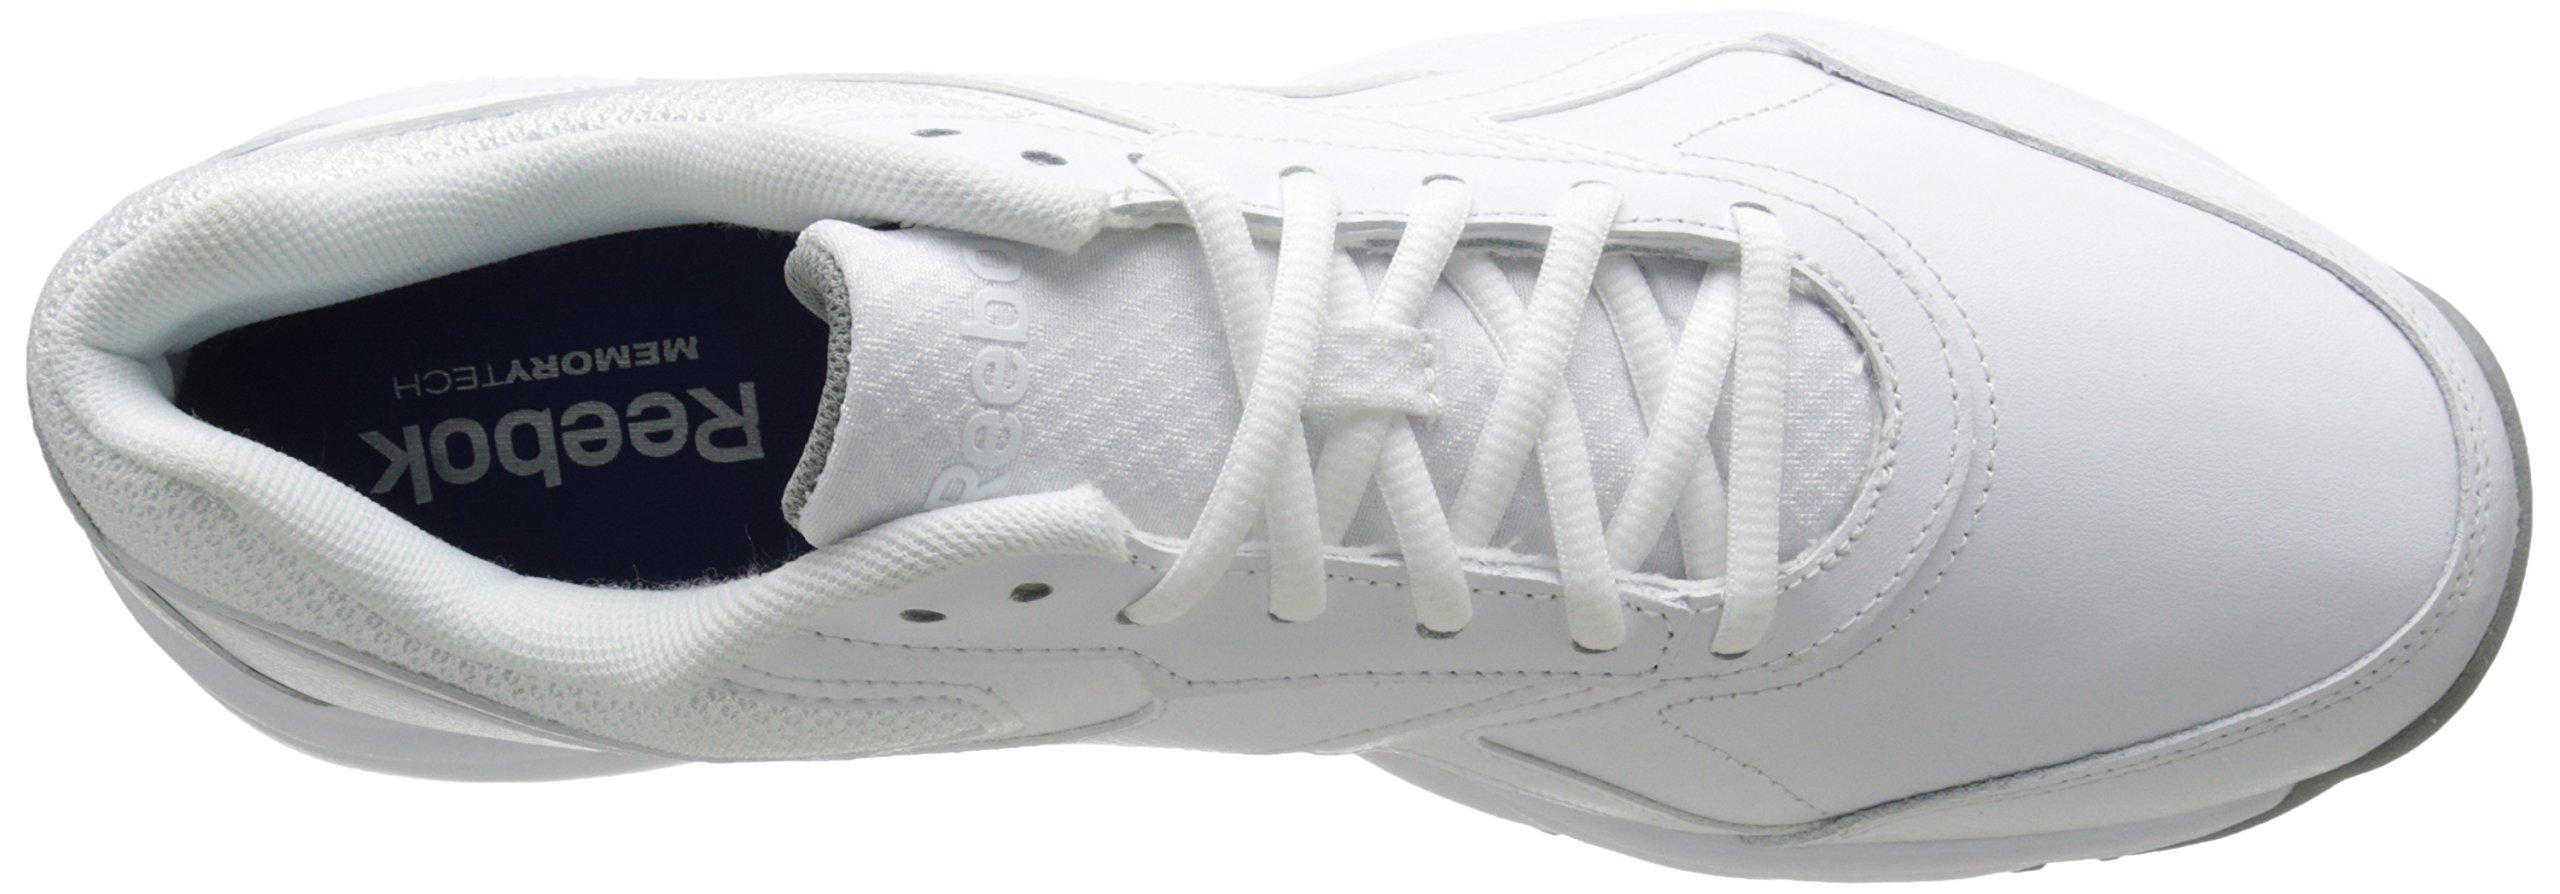 37c34e04 Reebok Men's Work N Cushion 2.0 Walking Shoe, White/Flat Grey, 8.5 ...